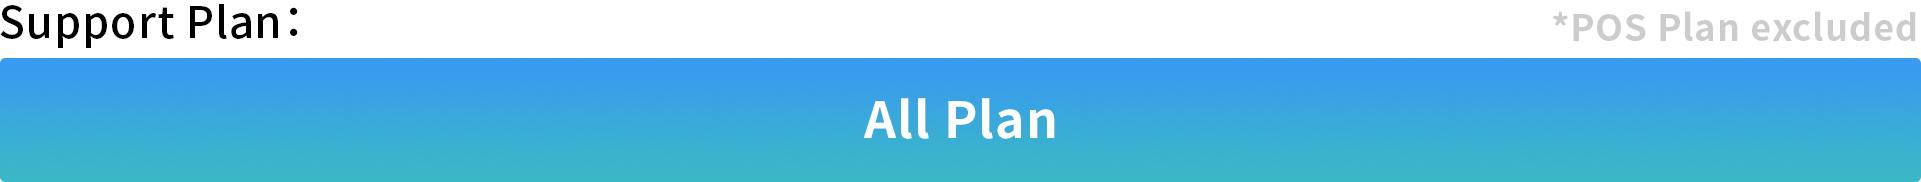 SHOPLINE_All-Plan.jpg